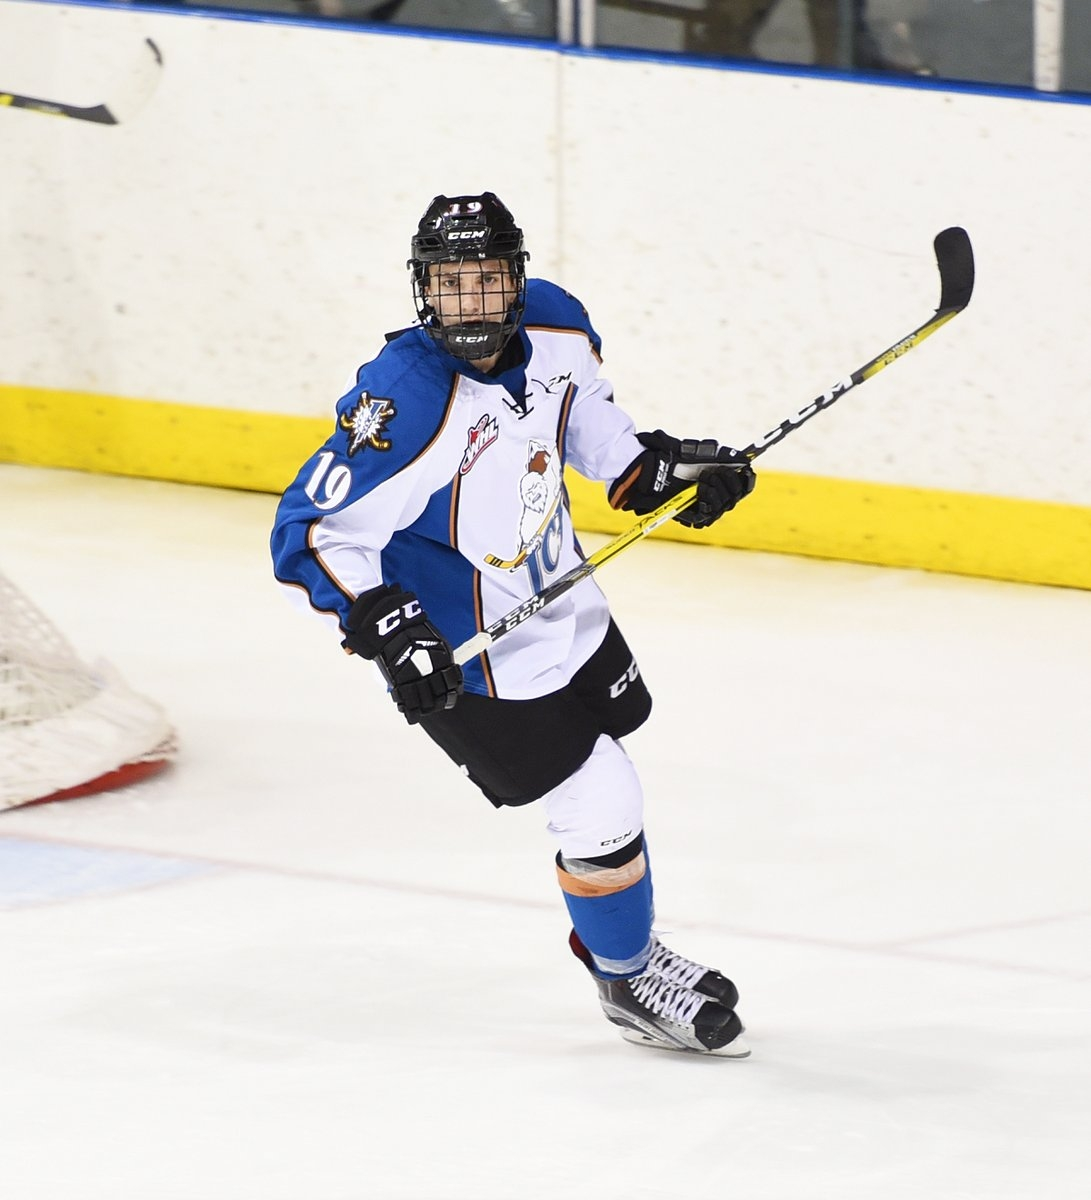 ICE prospect Krebs earns AMHL scoring title